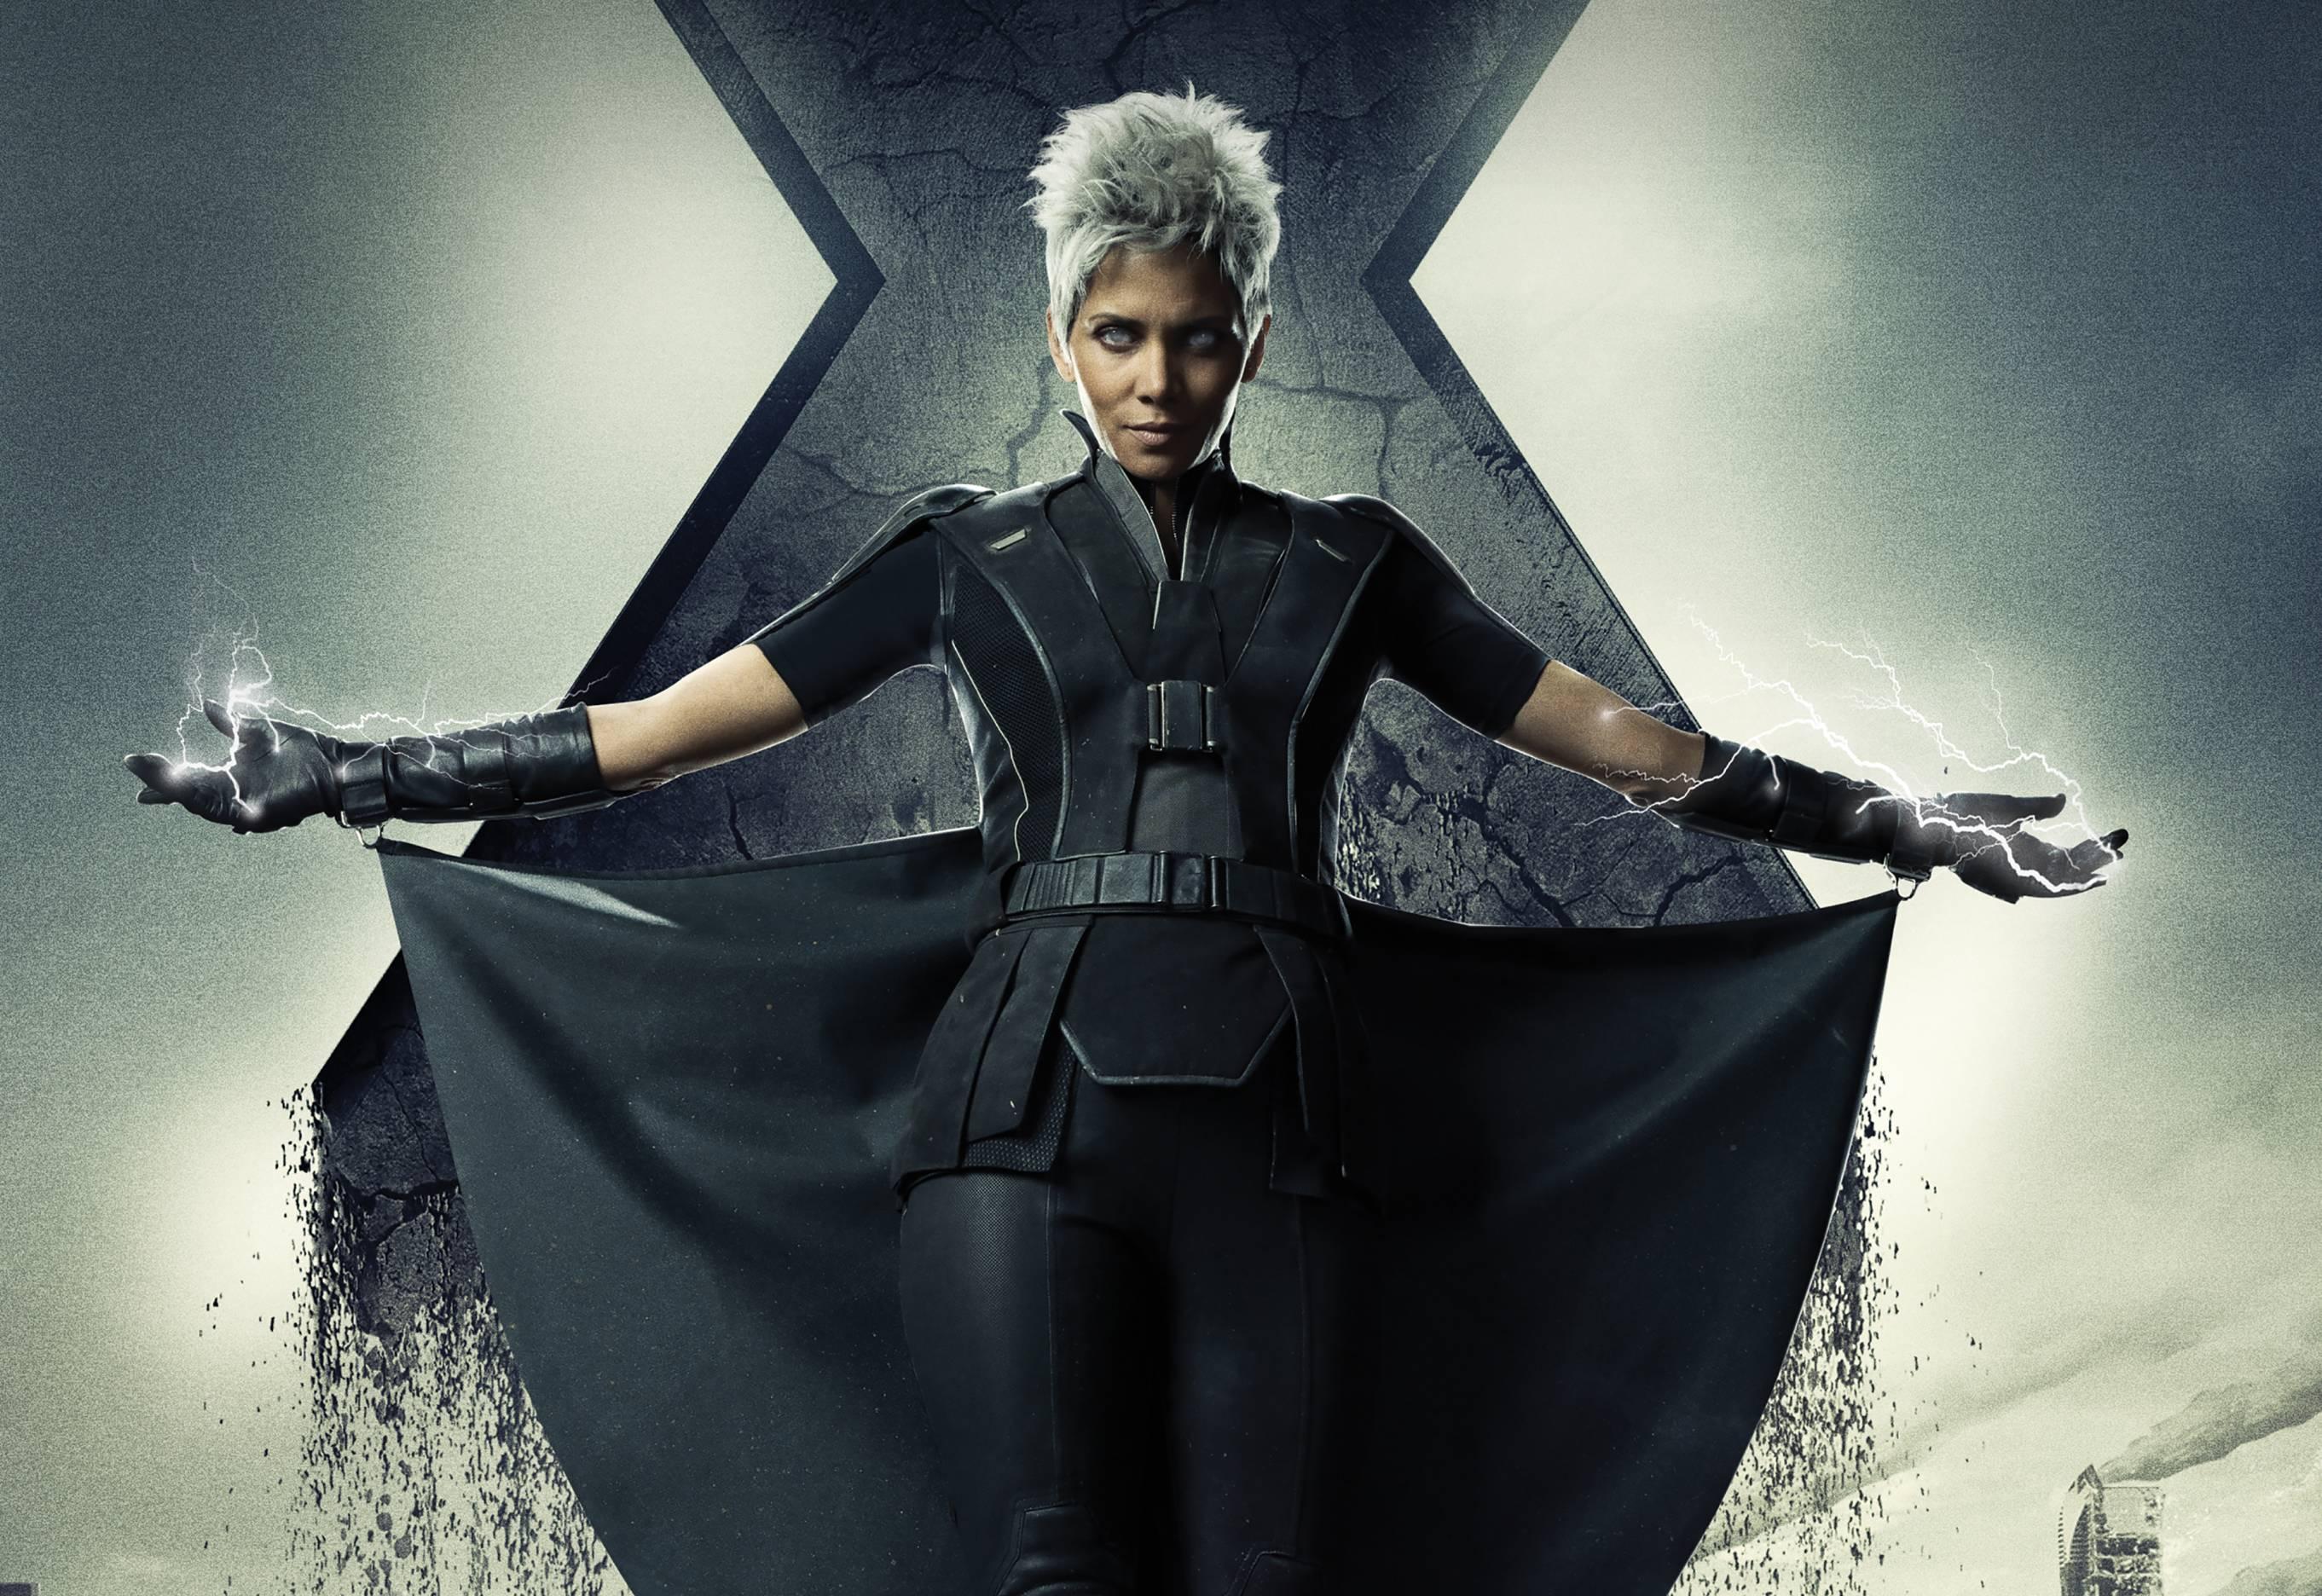 X-Men: Days of Future Past Storm